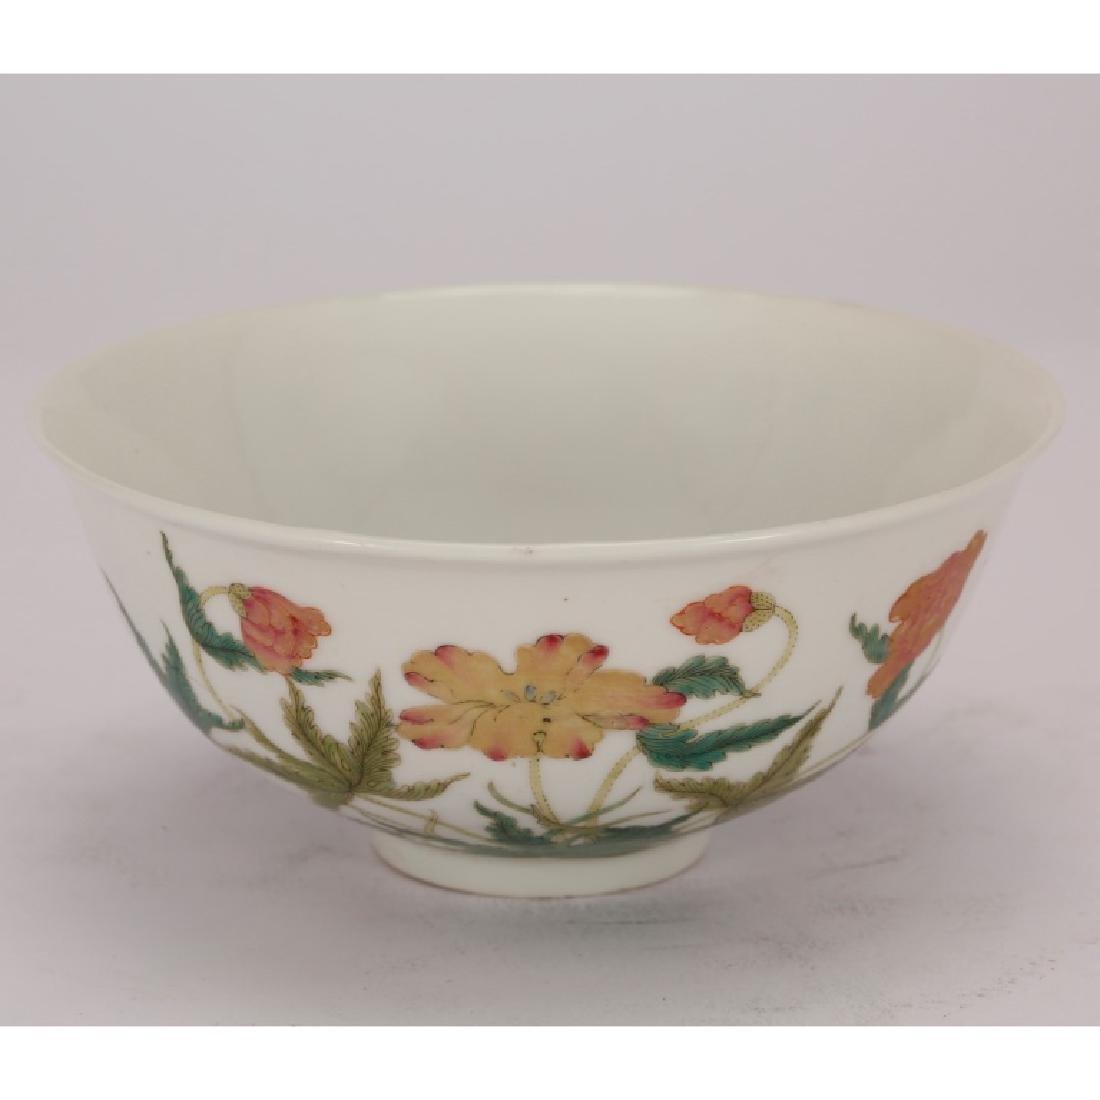 Chinese Fencai Enameled Porcelain Floral Bowl